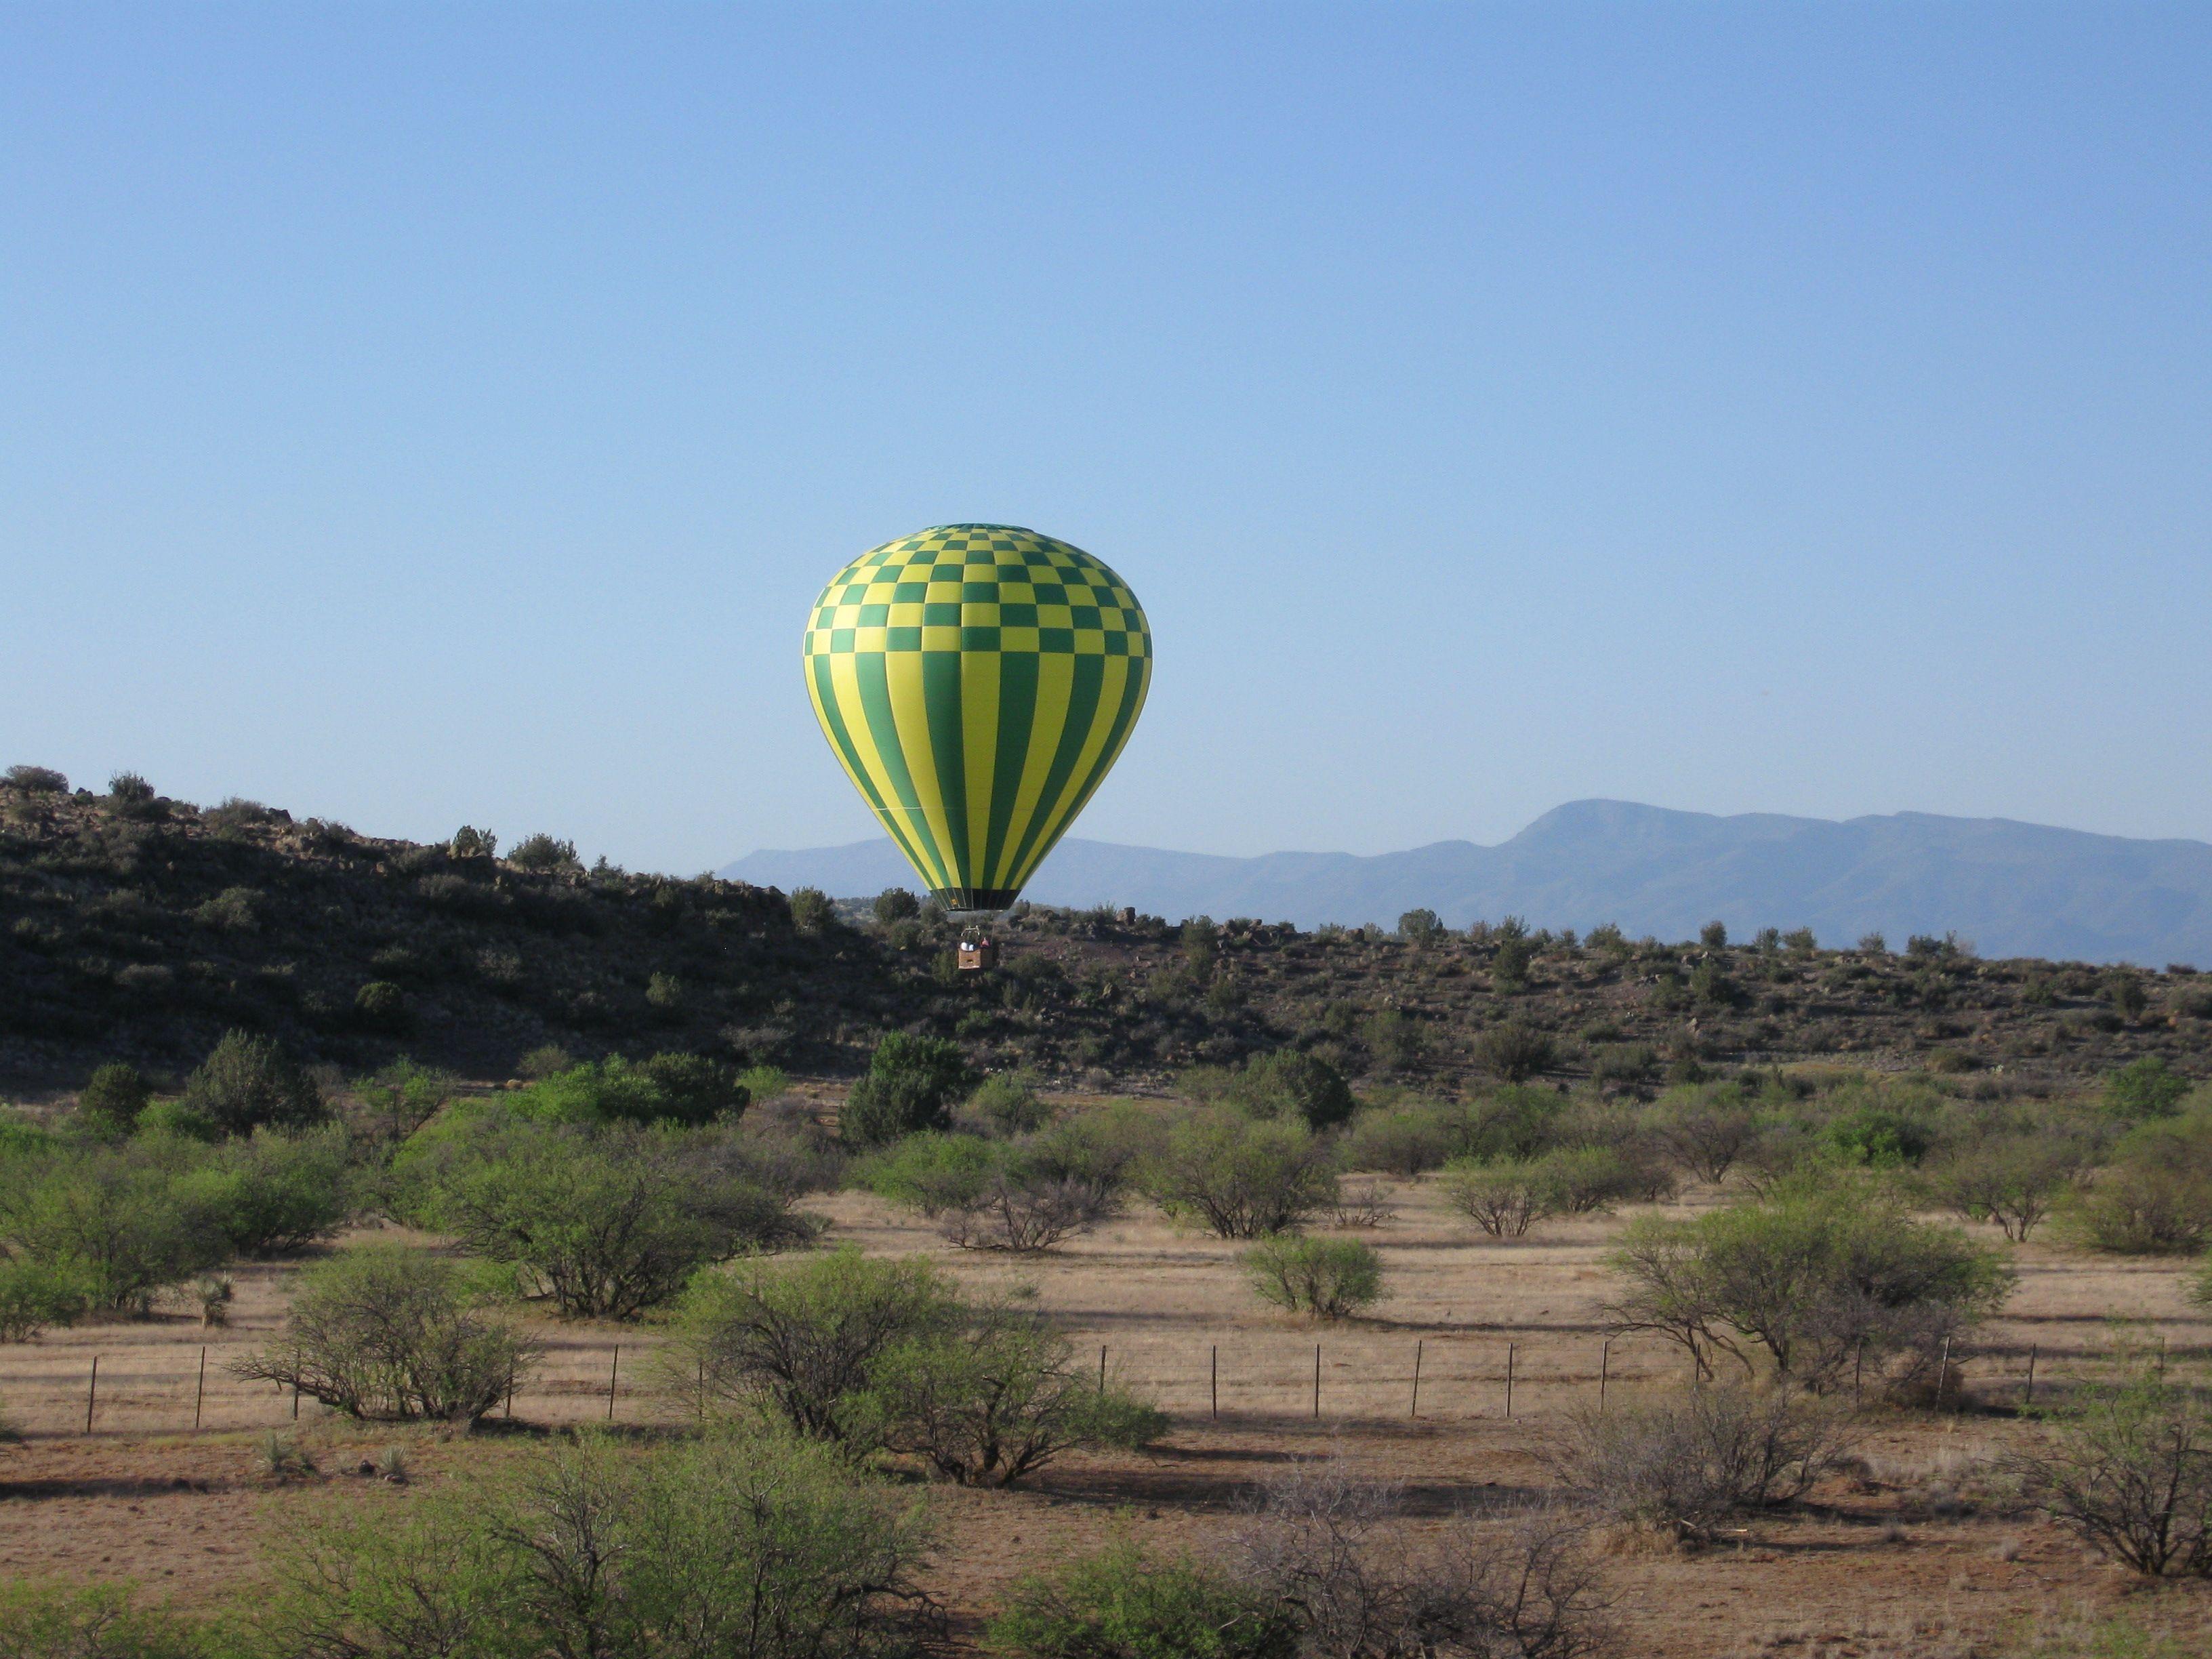 Hot Air Ballooning in Sedona AZ Ballooning, Wonderful